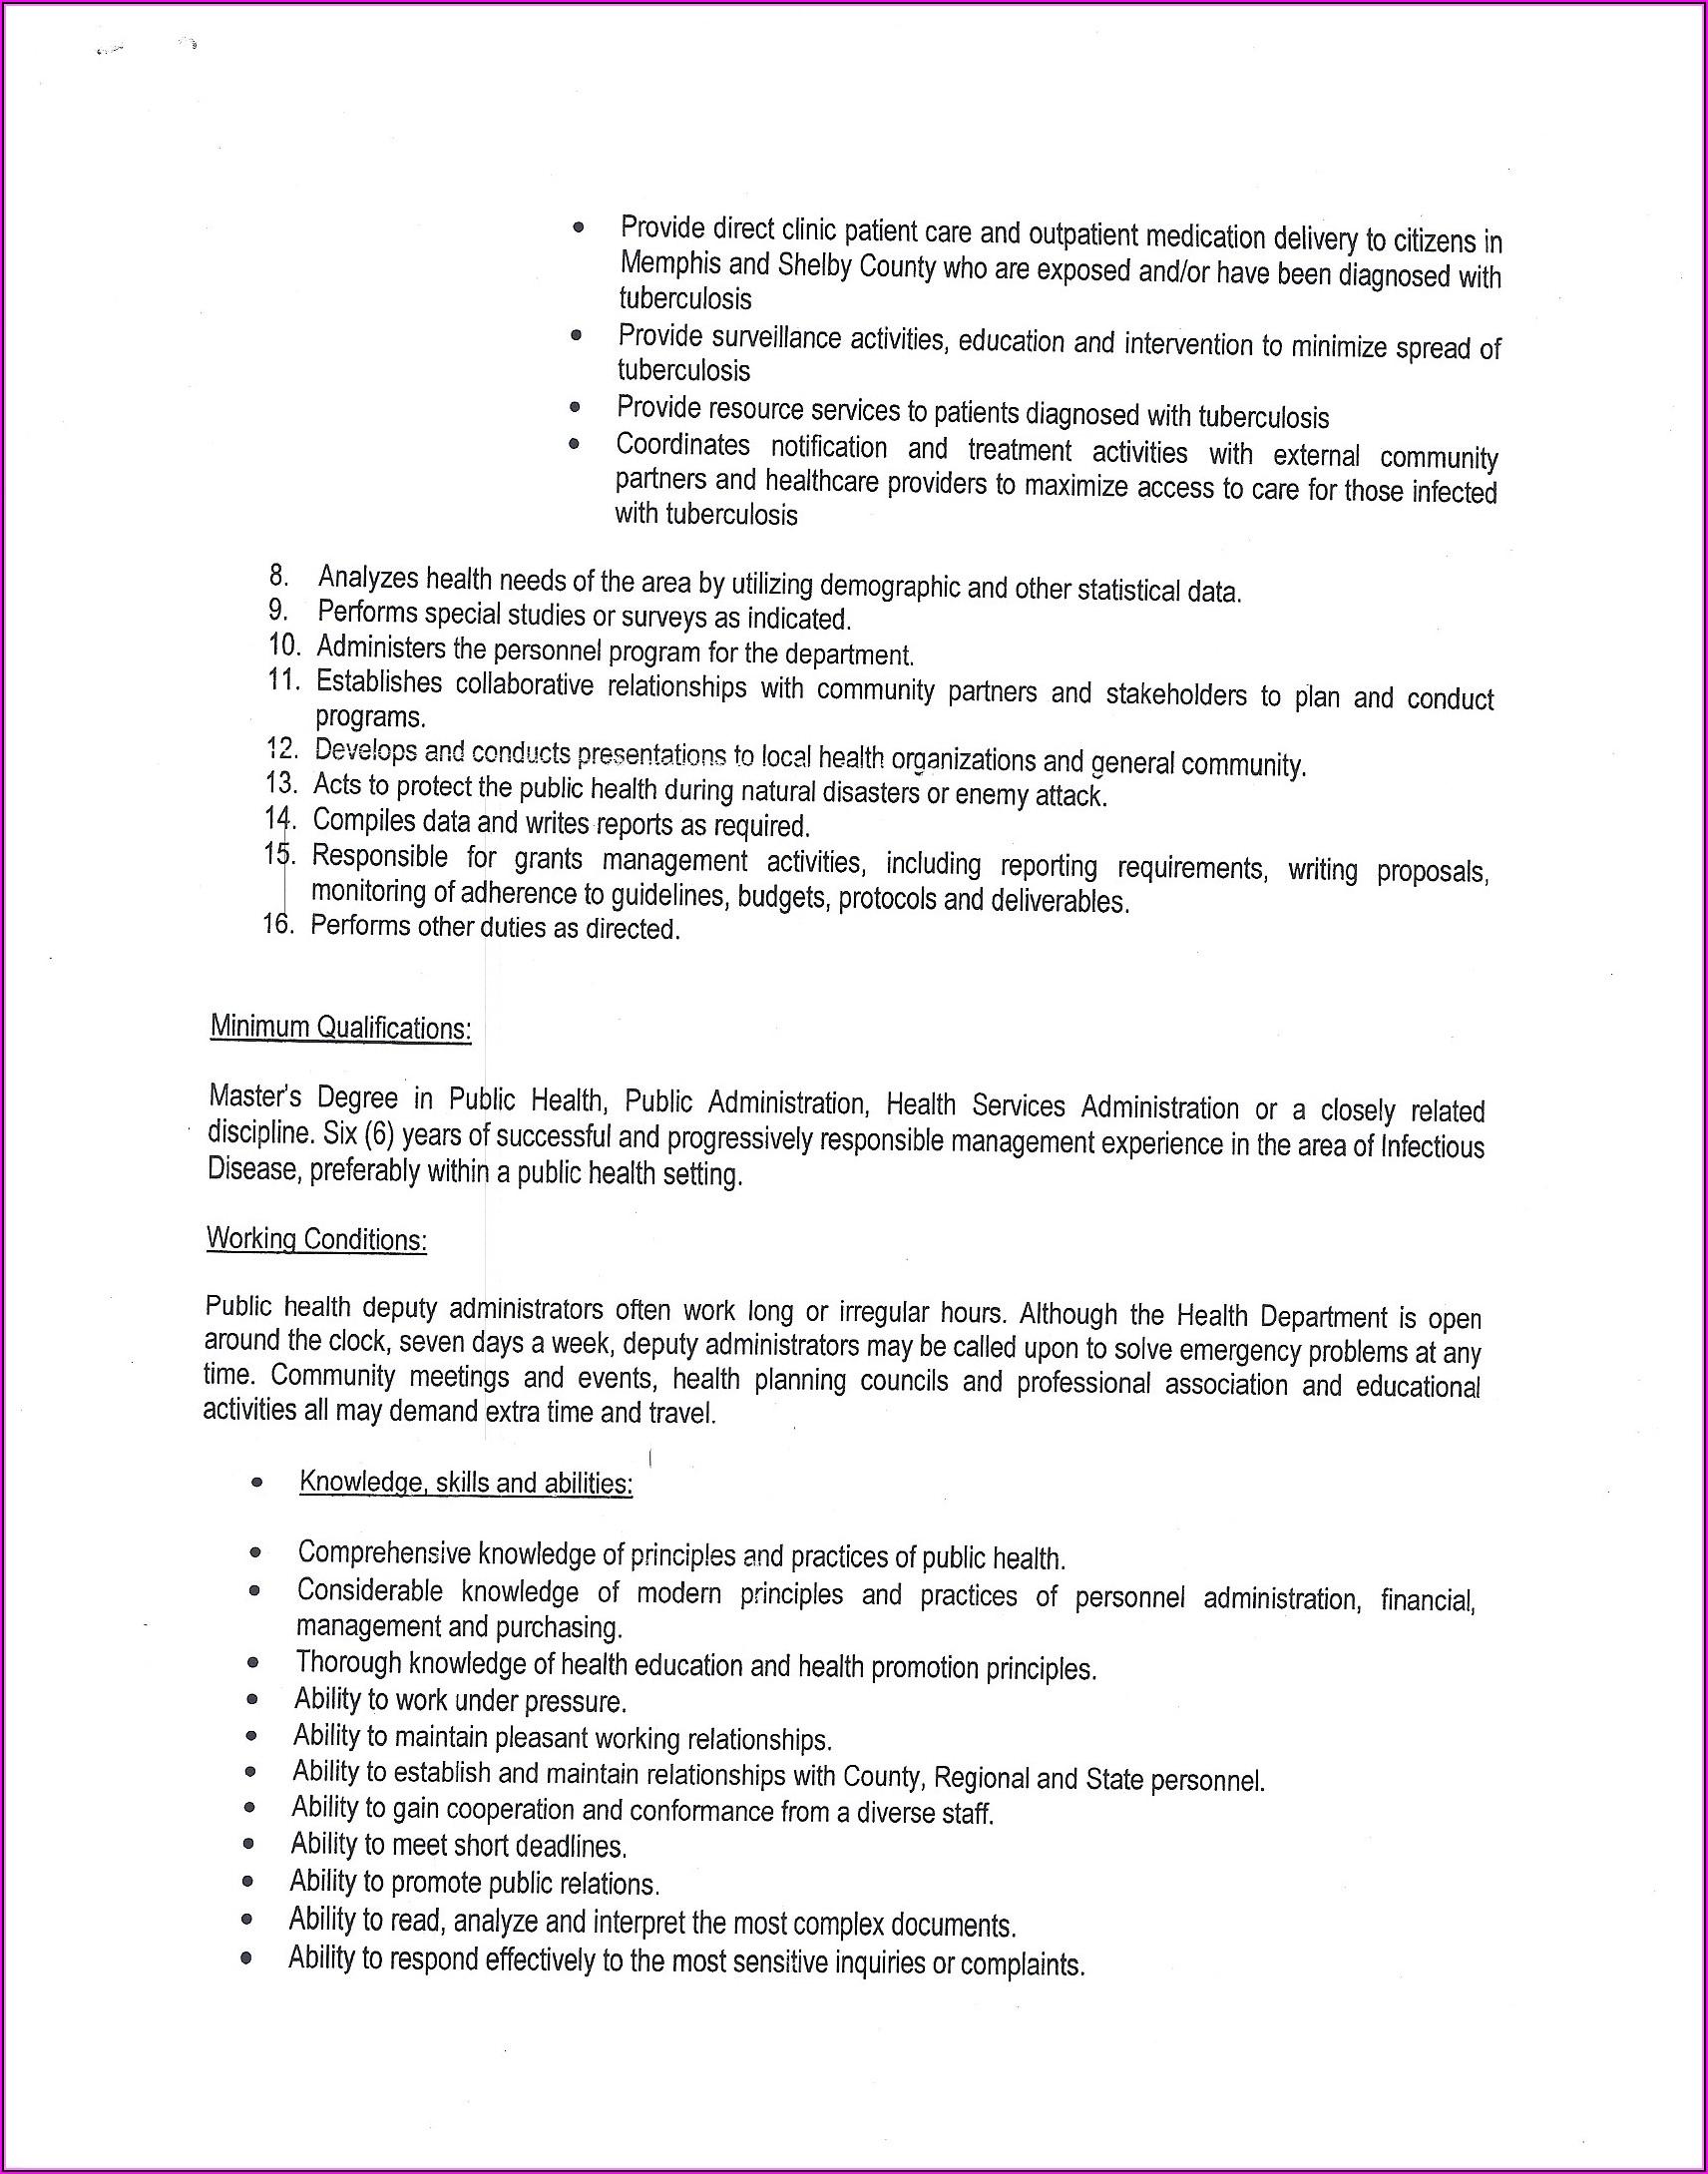 Professional Resume Services Miami